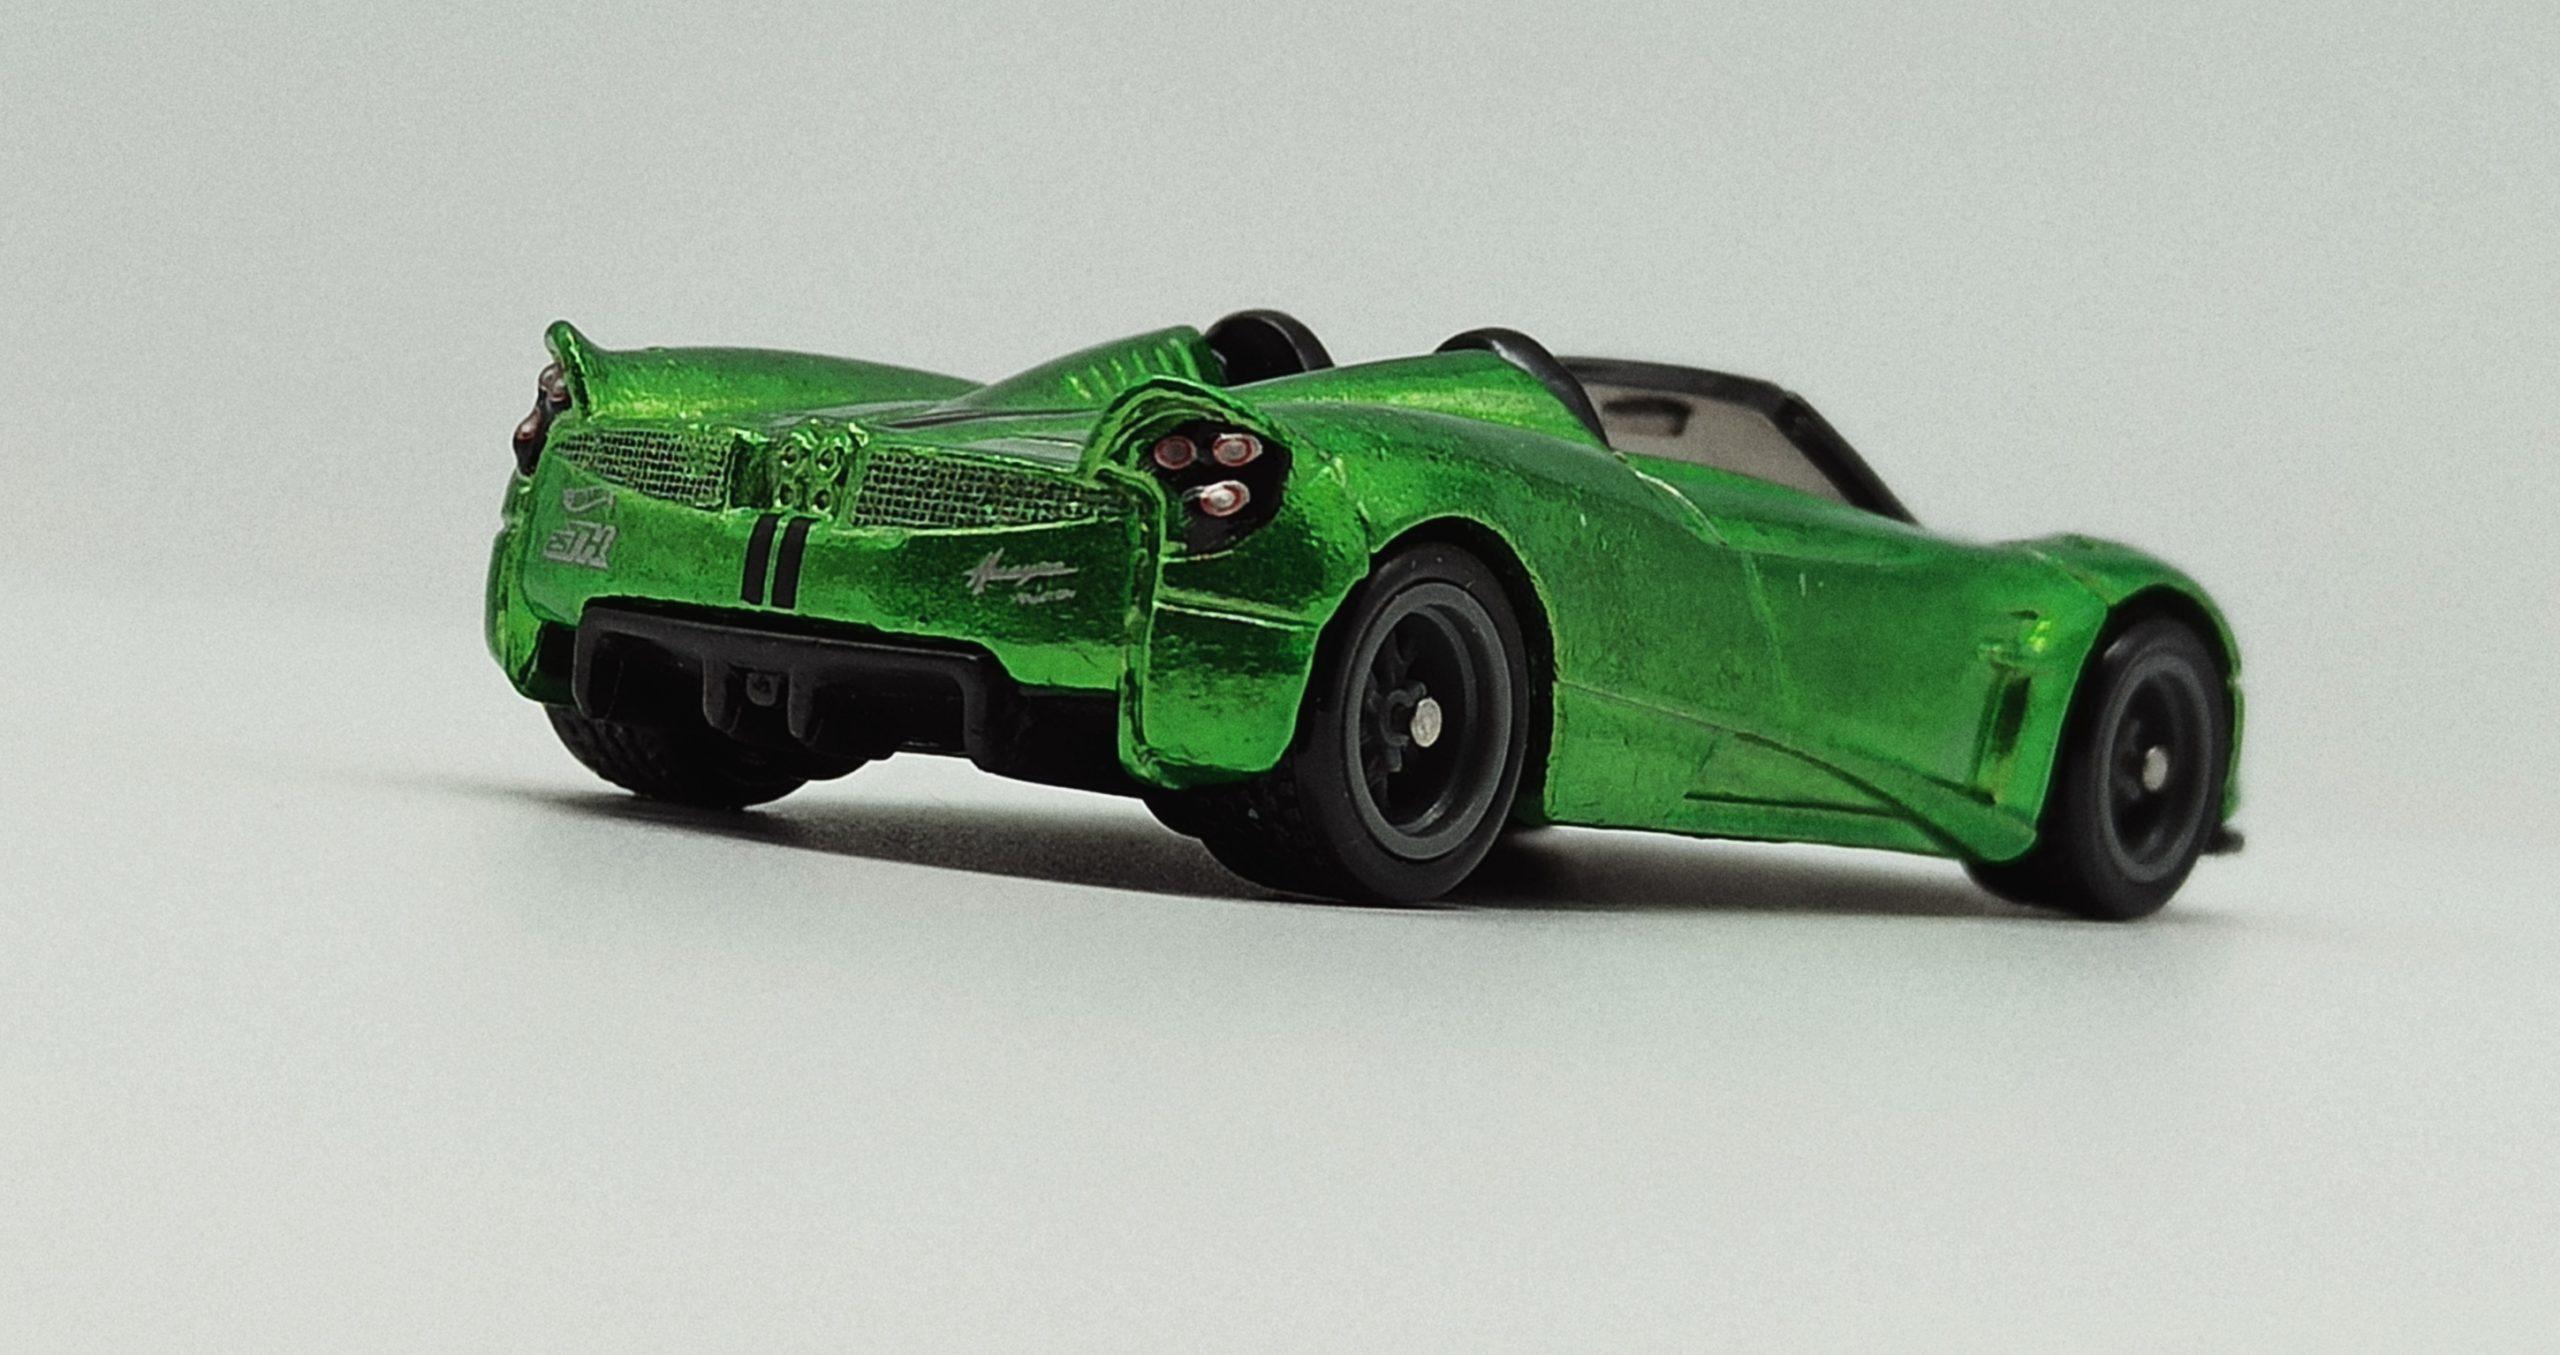 Hot Wheels '17 Pagani Huayra Roadster (GHG21) 2020 (241/250) HW Roadsters (5/5) spectraflame green Super Treasure Hunt (STH)back angle